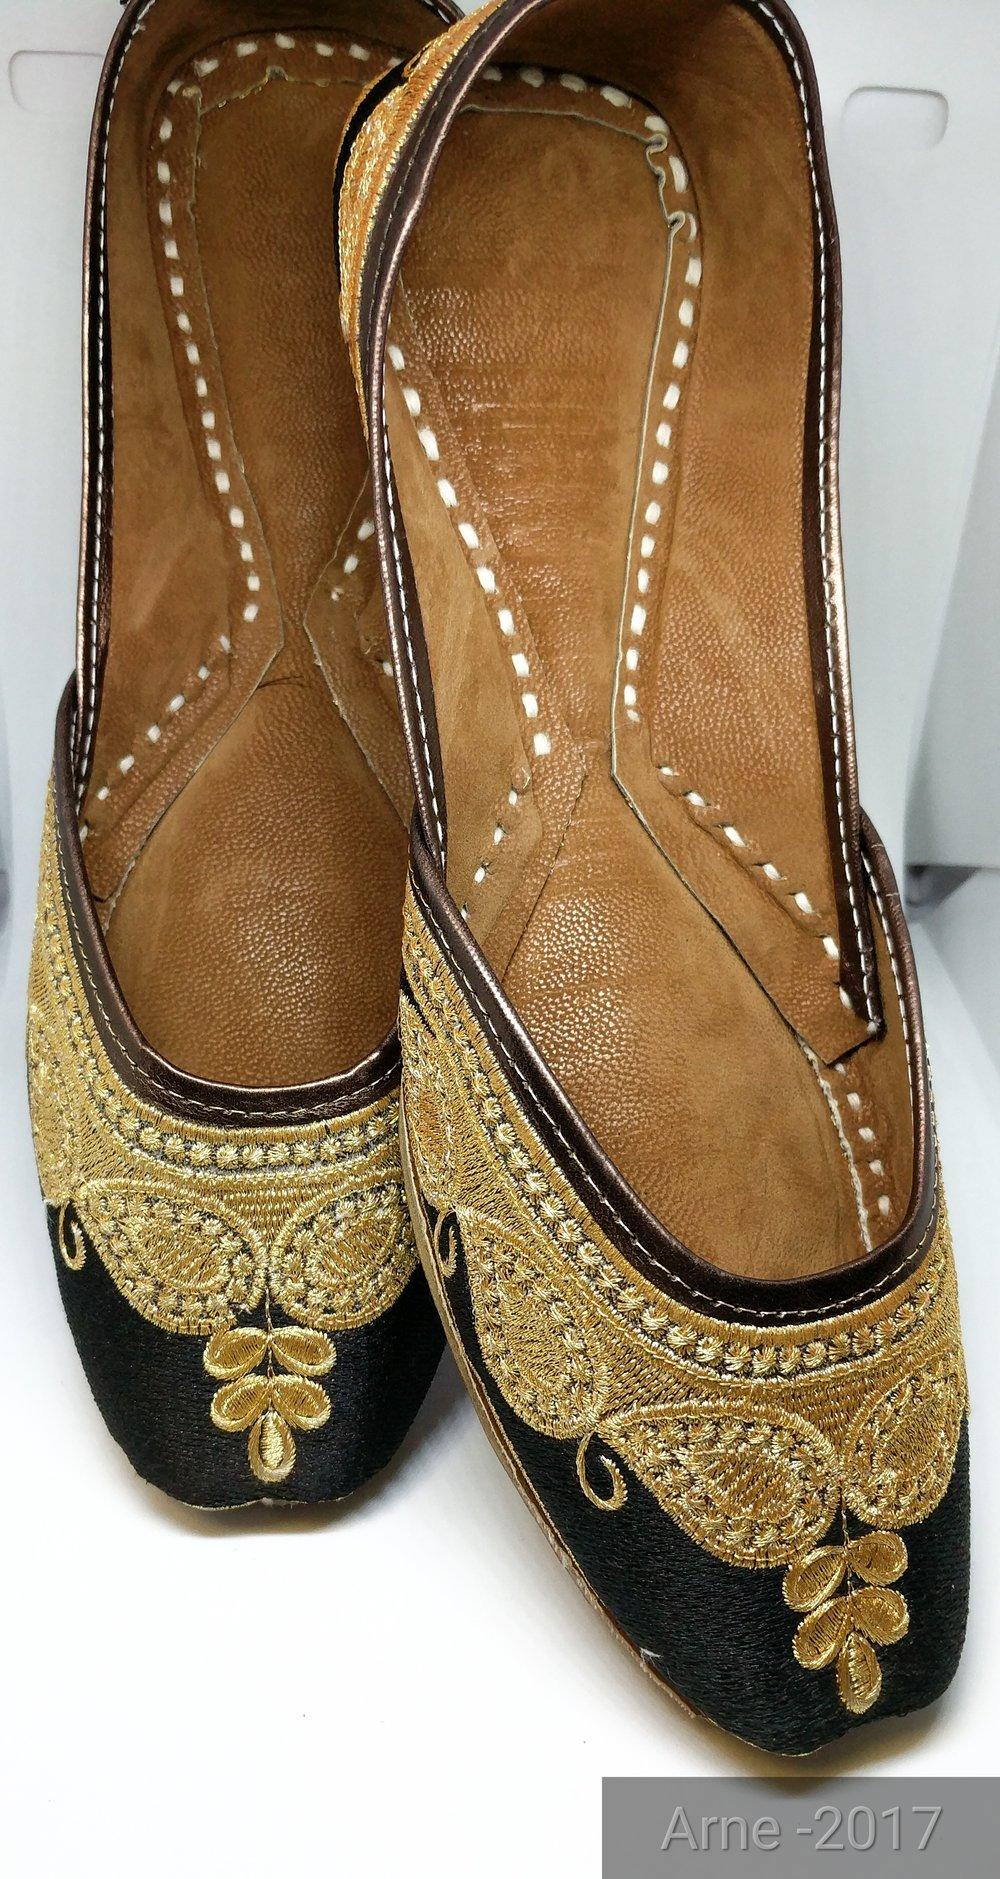 Jeans Juti - Handmade from Punjab